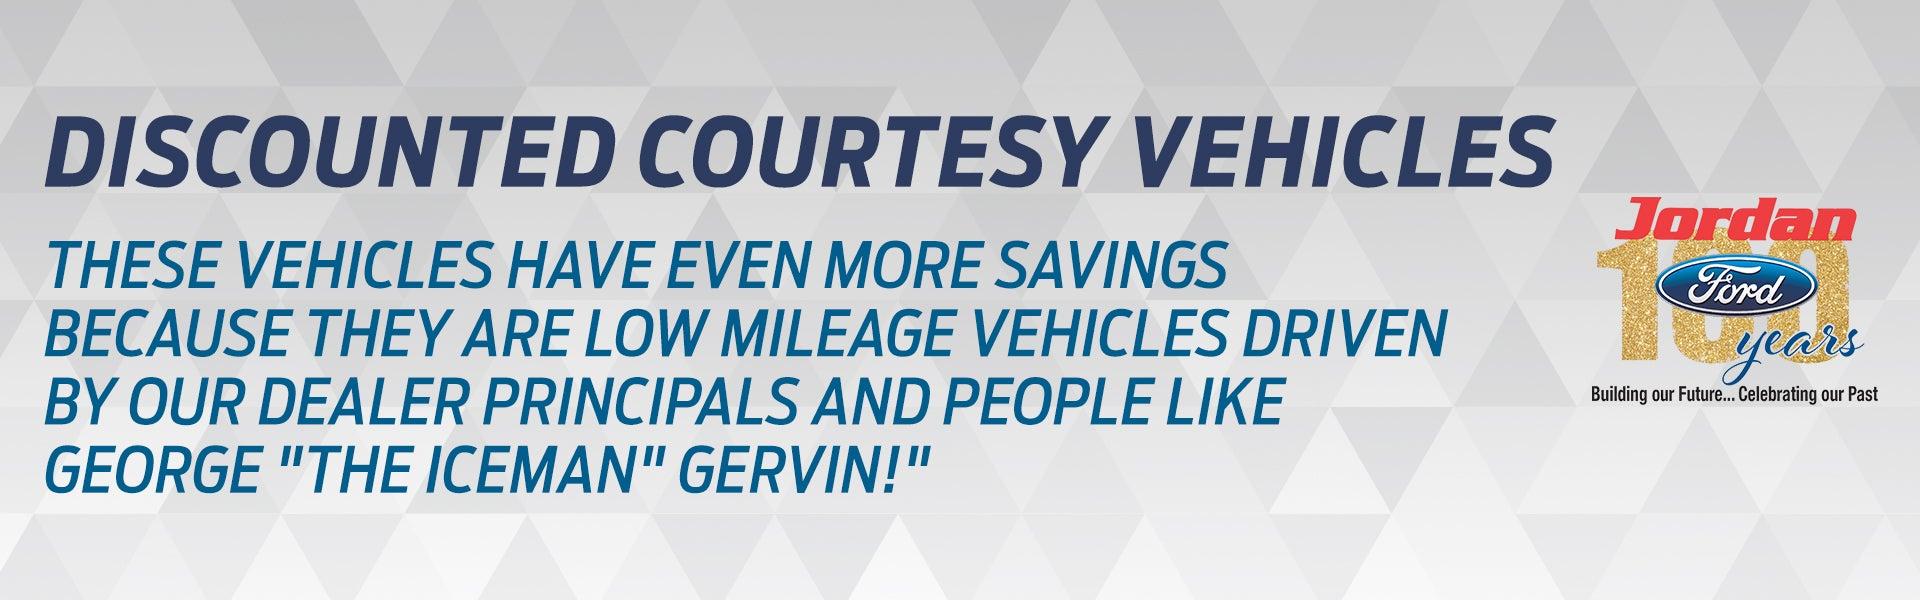 Discounted Courtesy Vehicles Ford Dealership In San Antonio Tx Jordan Ford